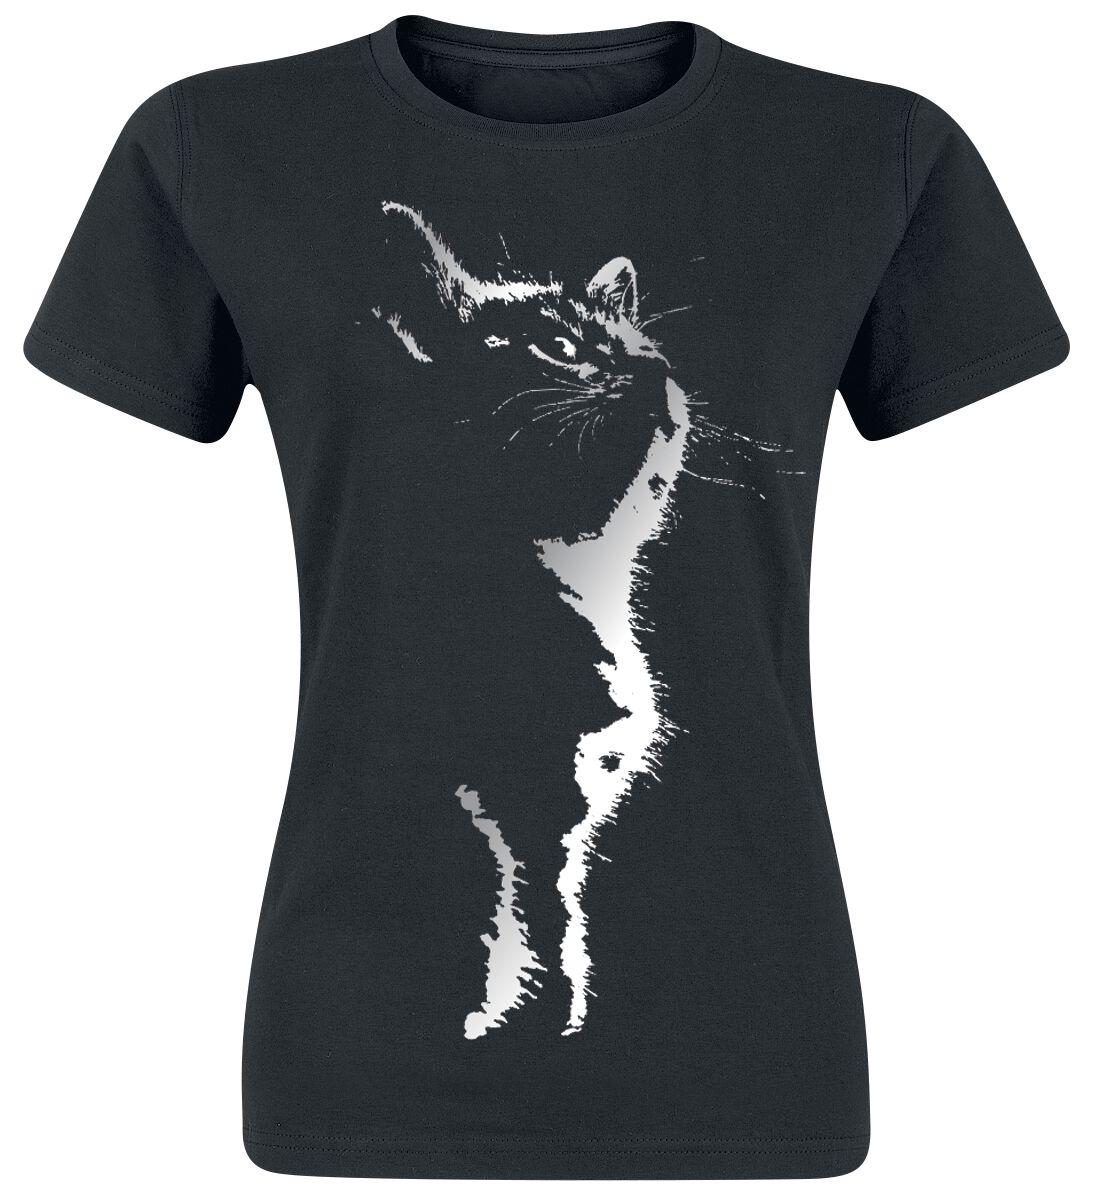 Fun Shirts - Koszulki - Koszulka damska Cat Silhouette Koszulka damska czarny - 359854